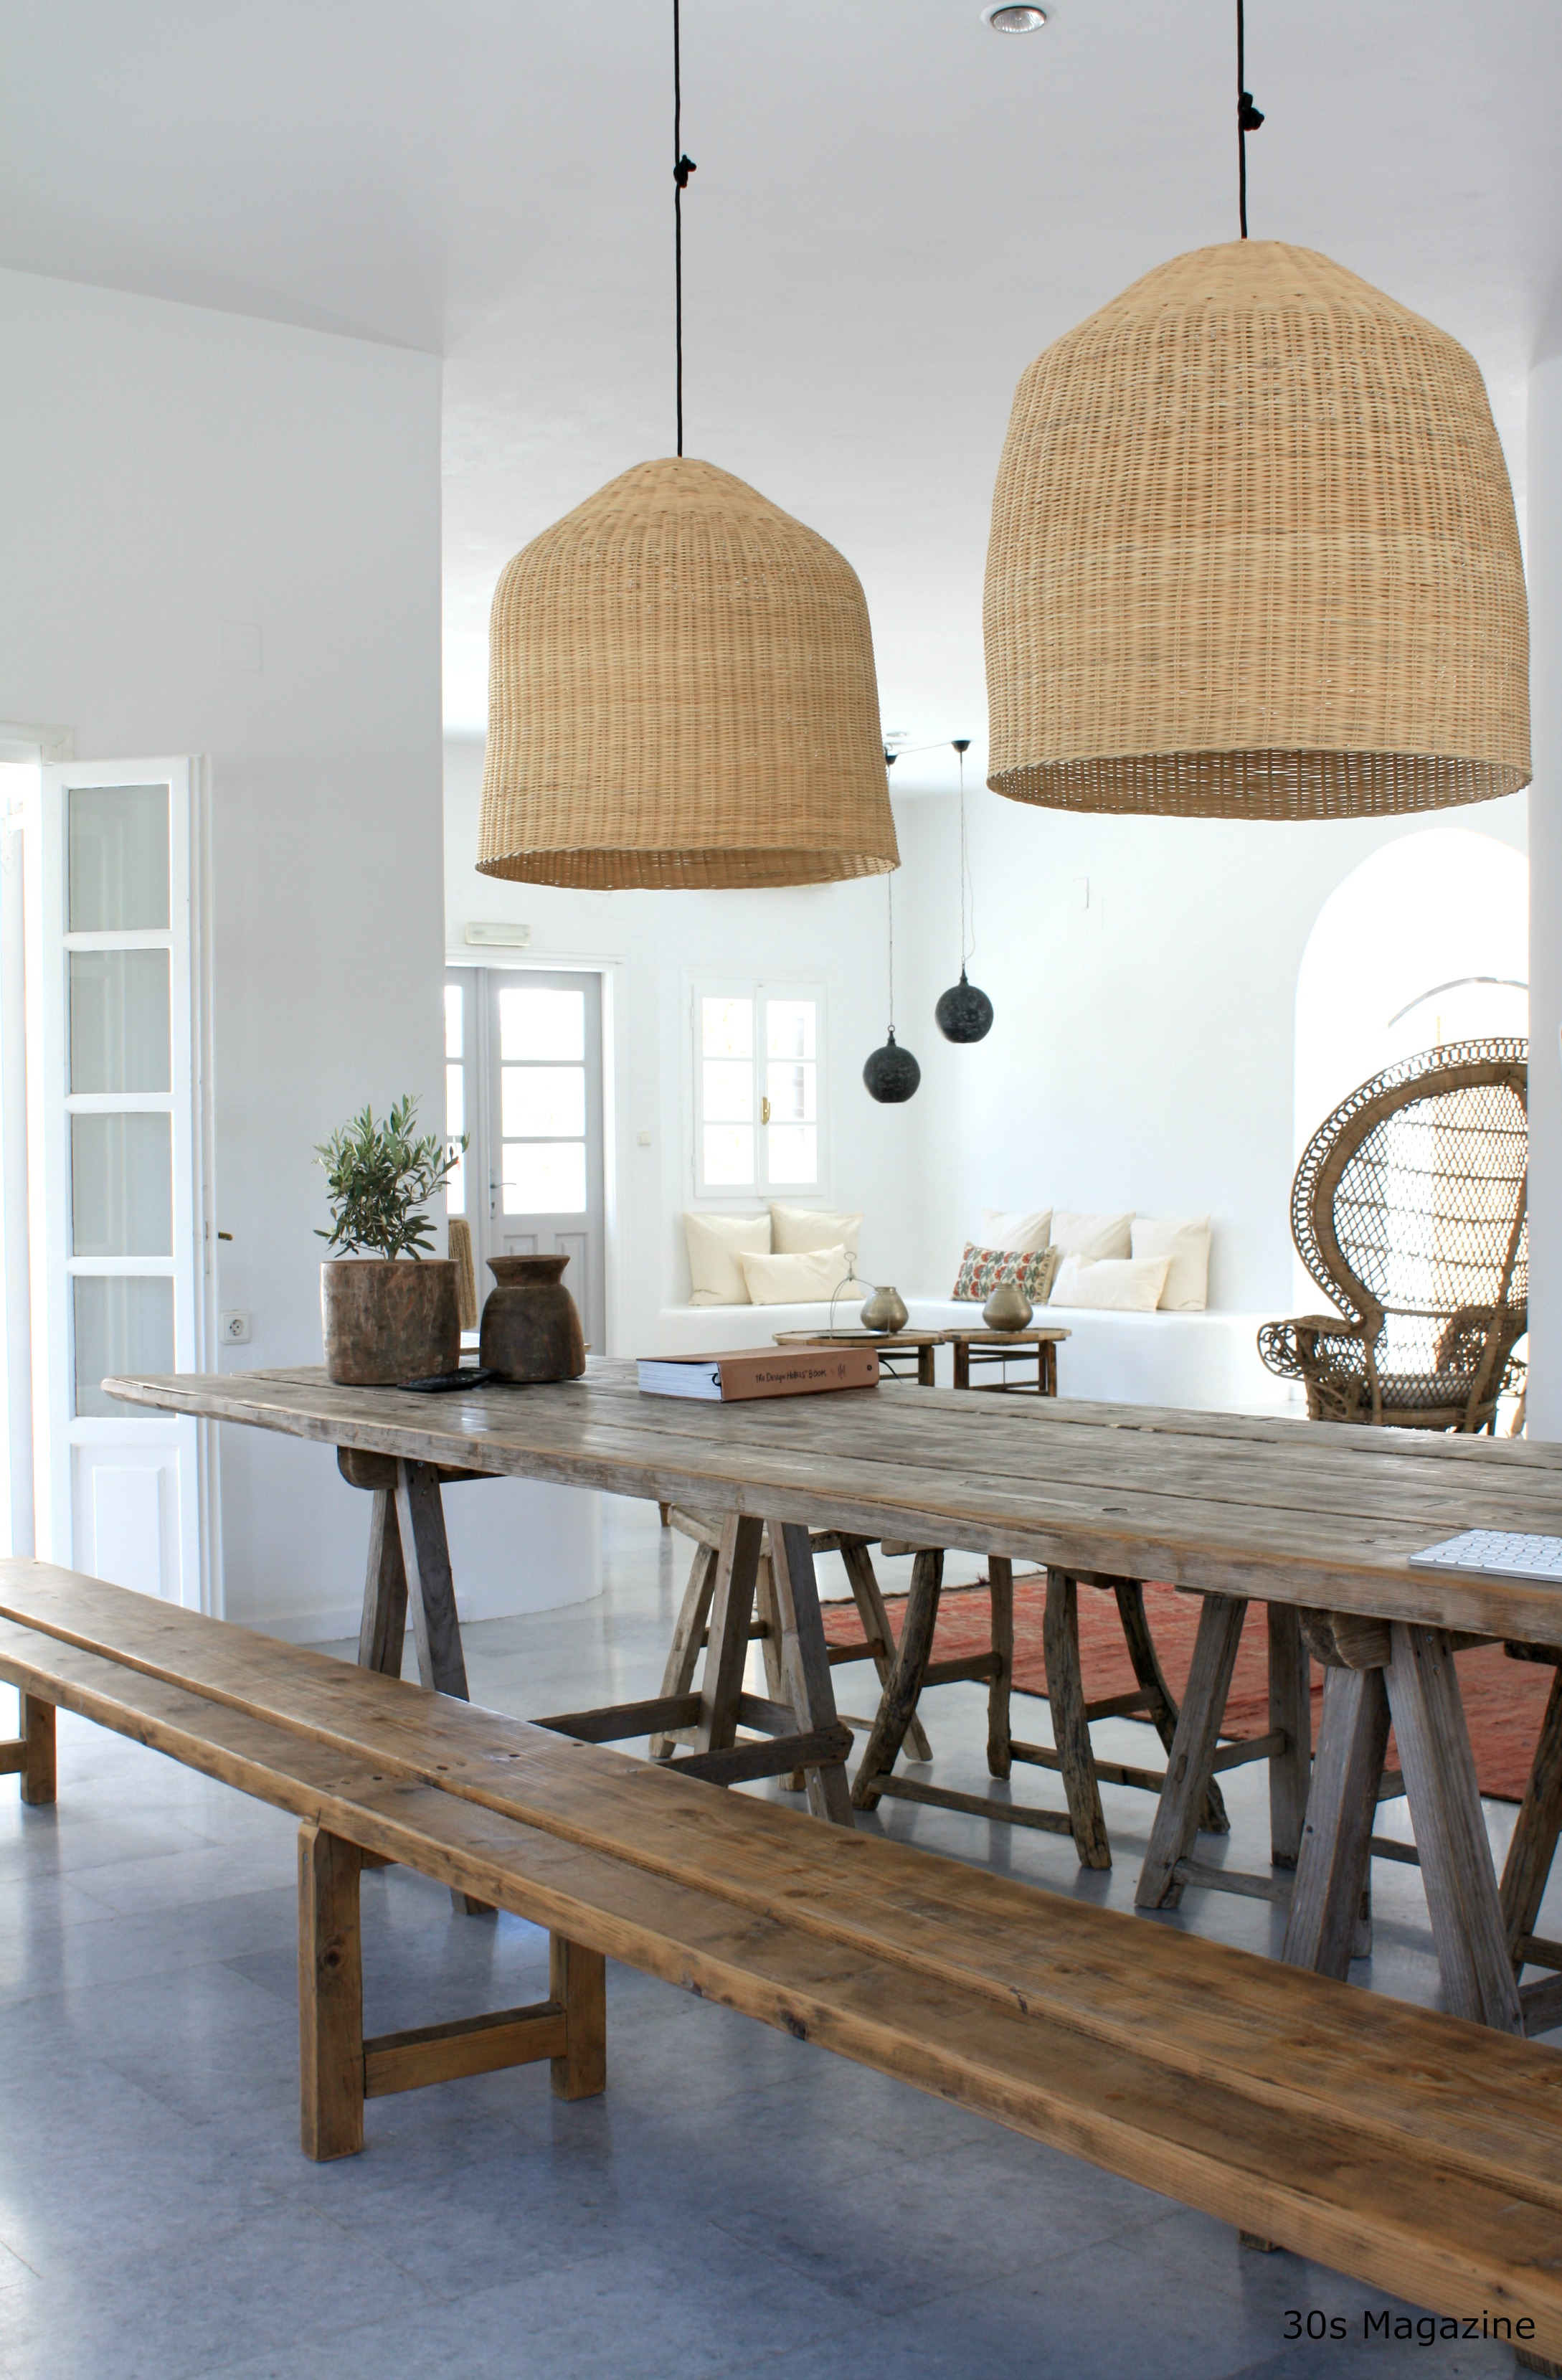 Trend: The Basket Lamp – 30s Magazine